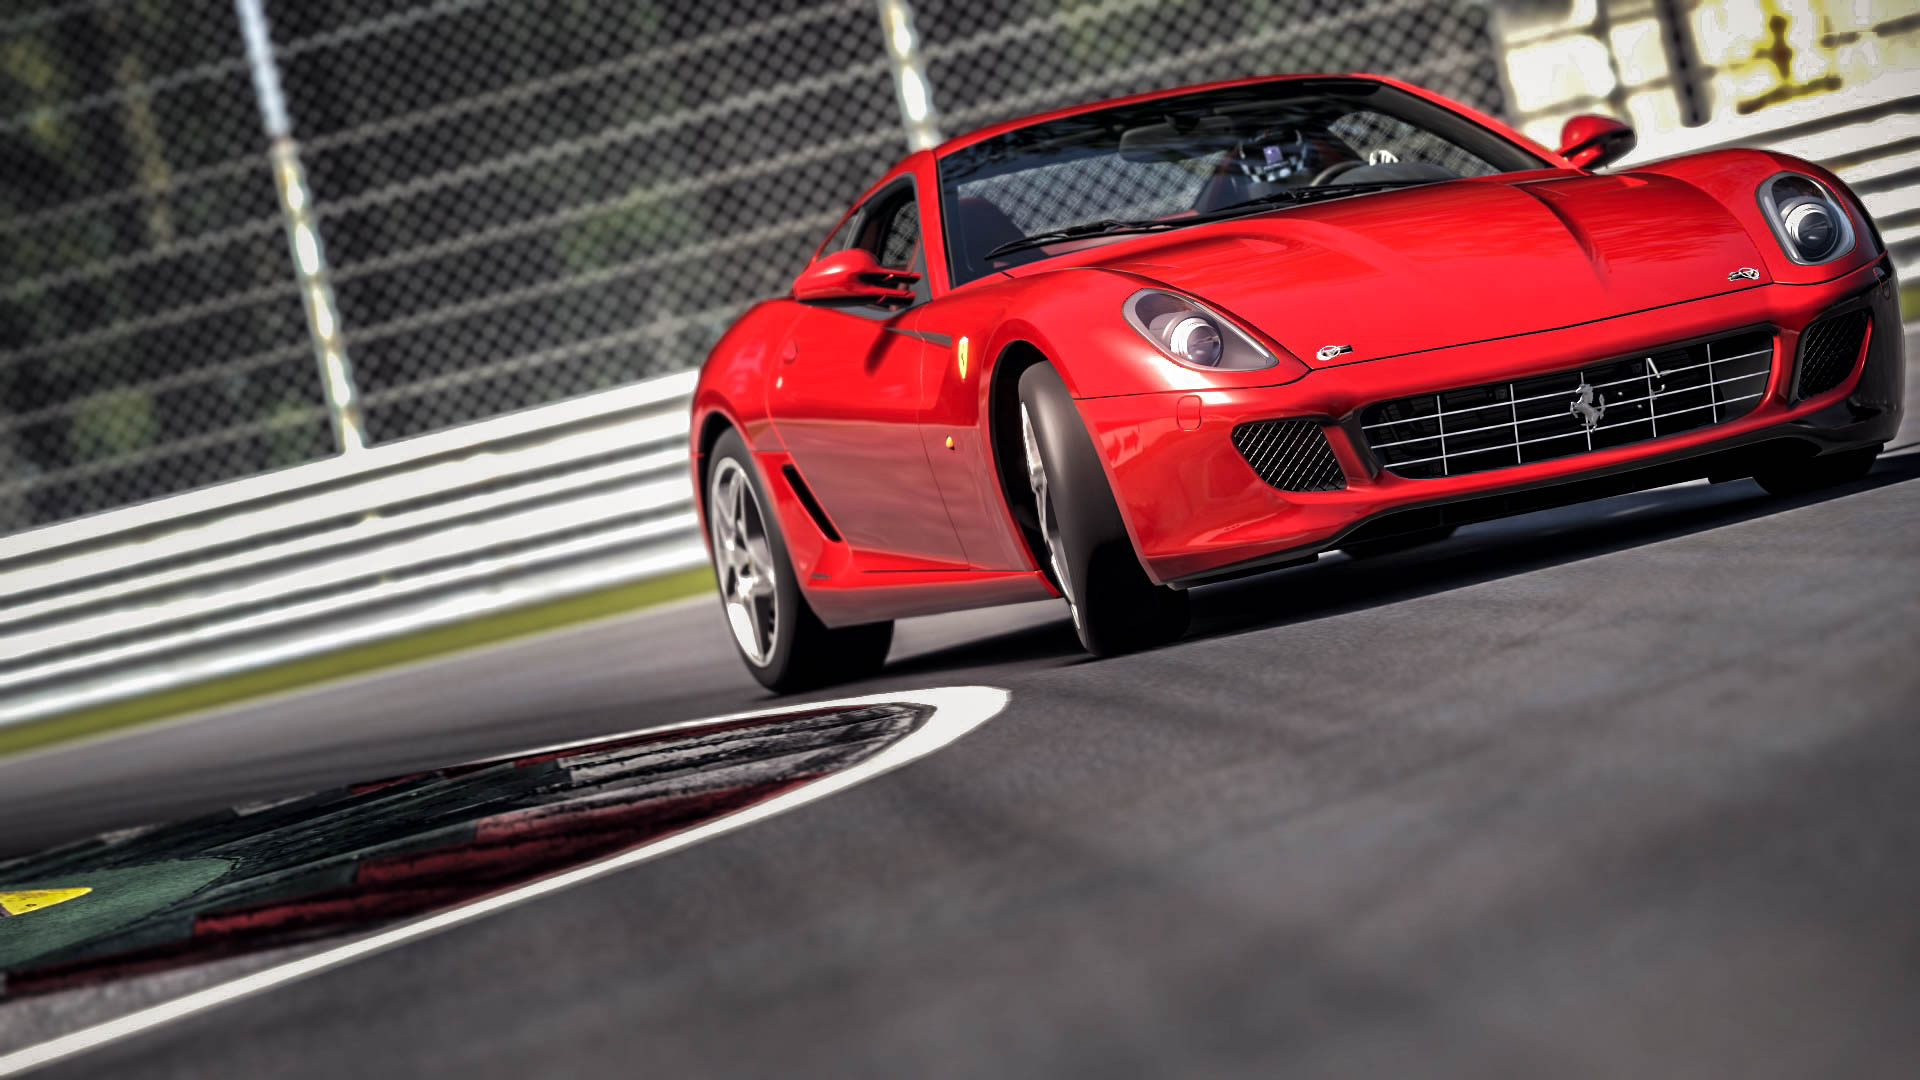 Ferrari_599_12.jpg